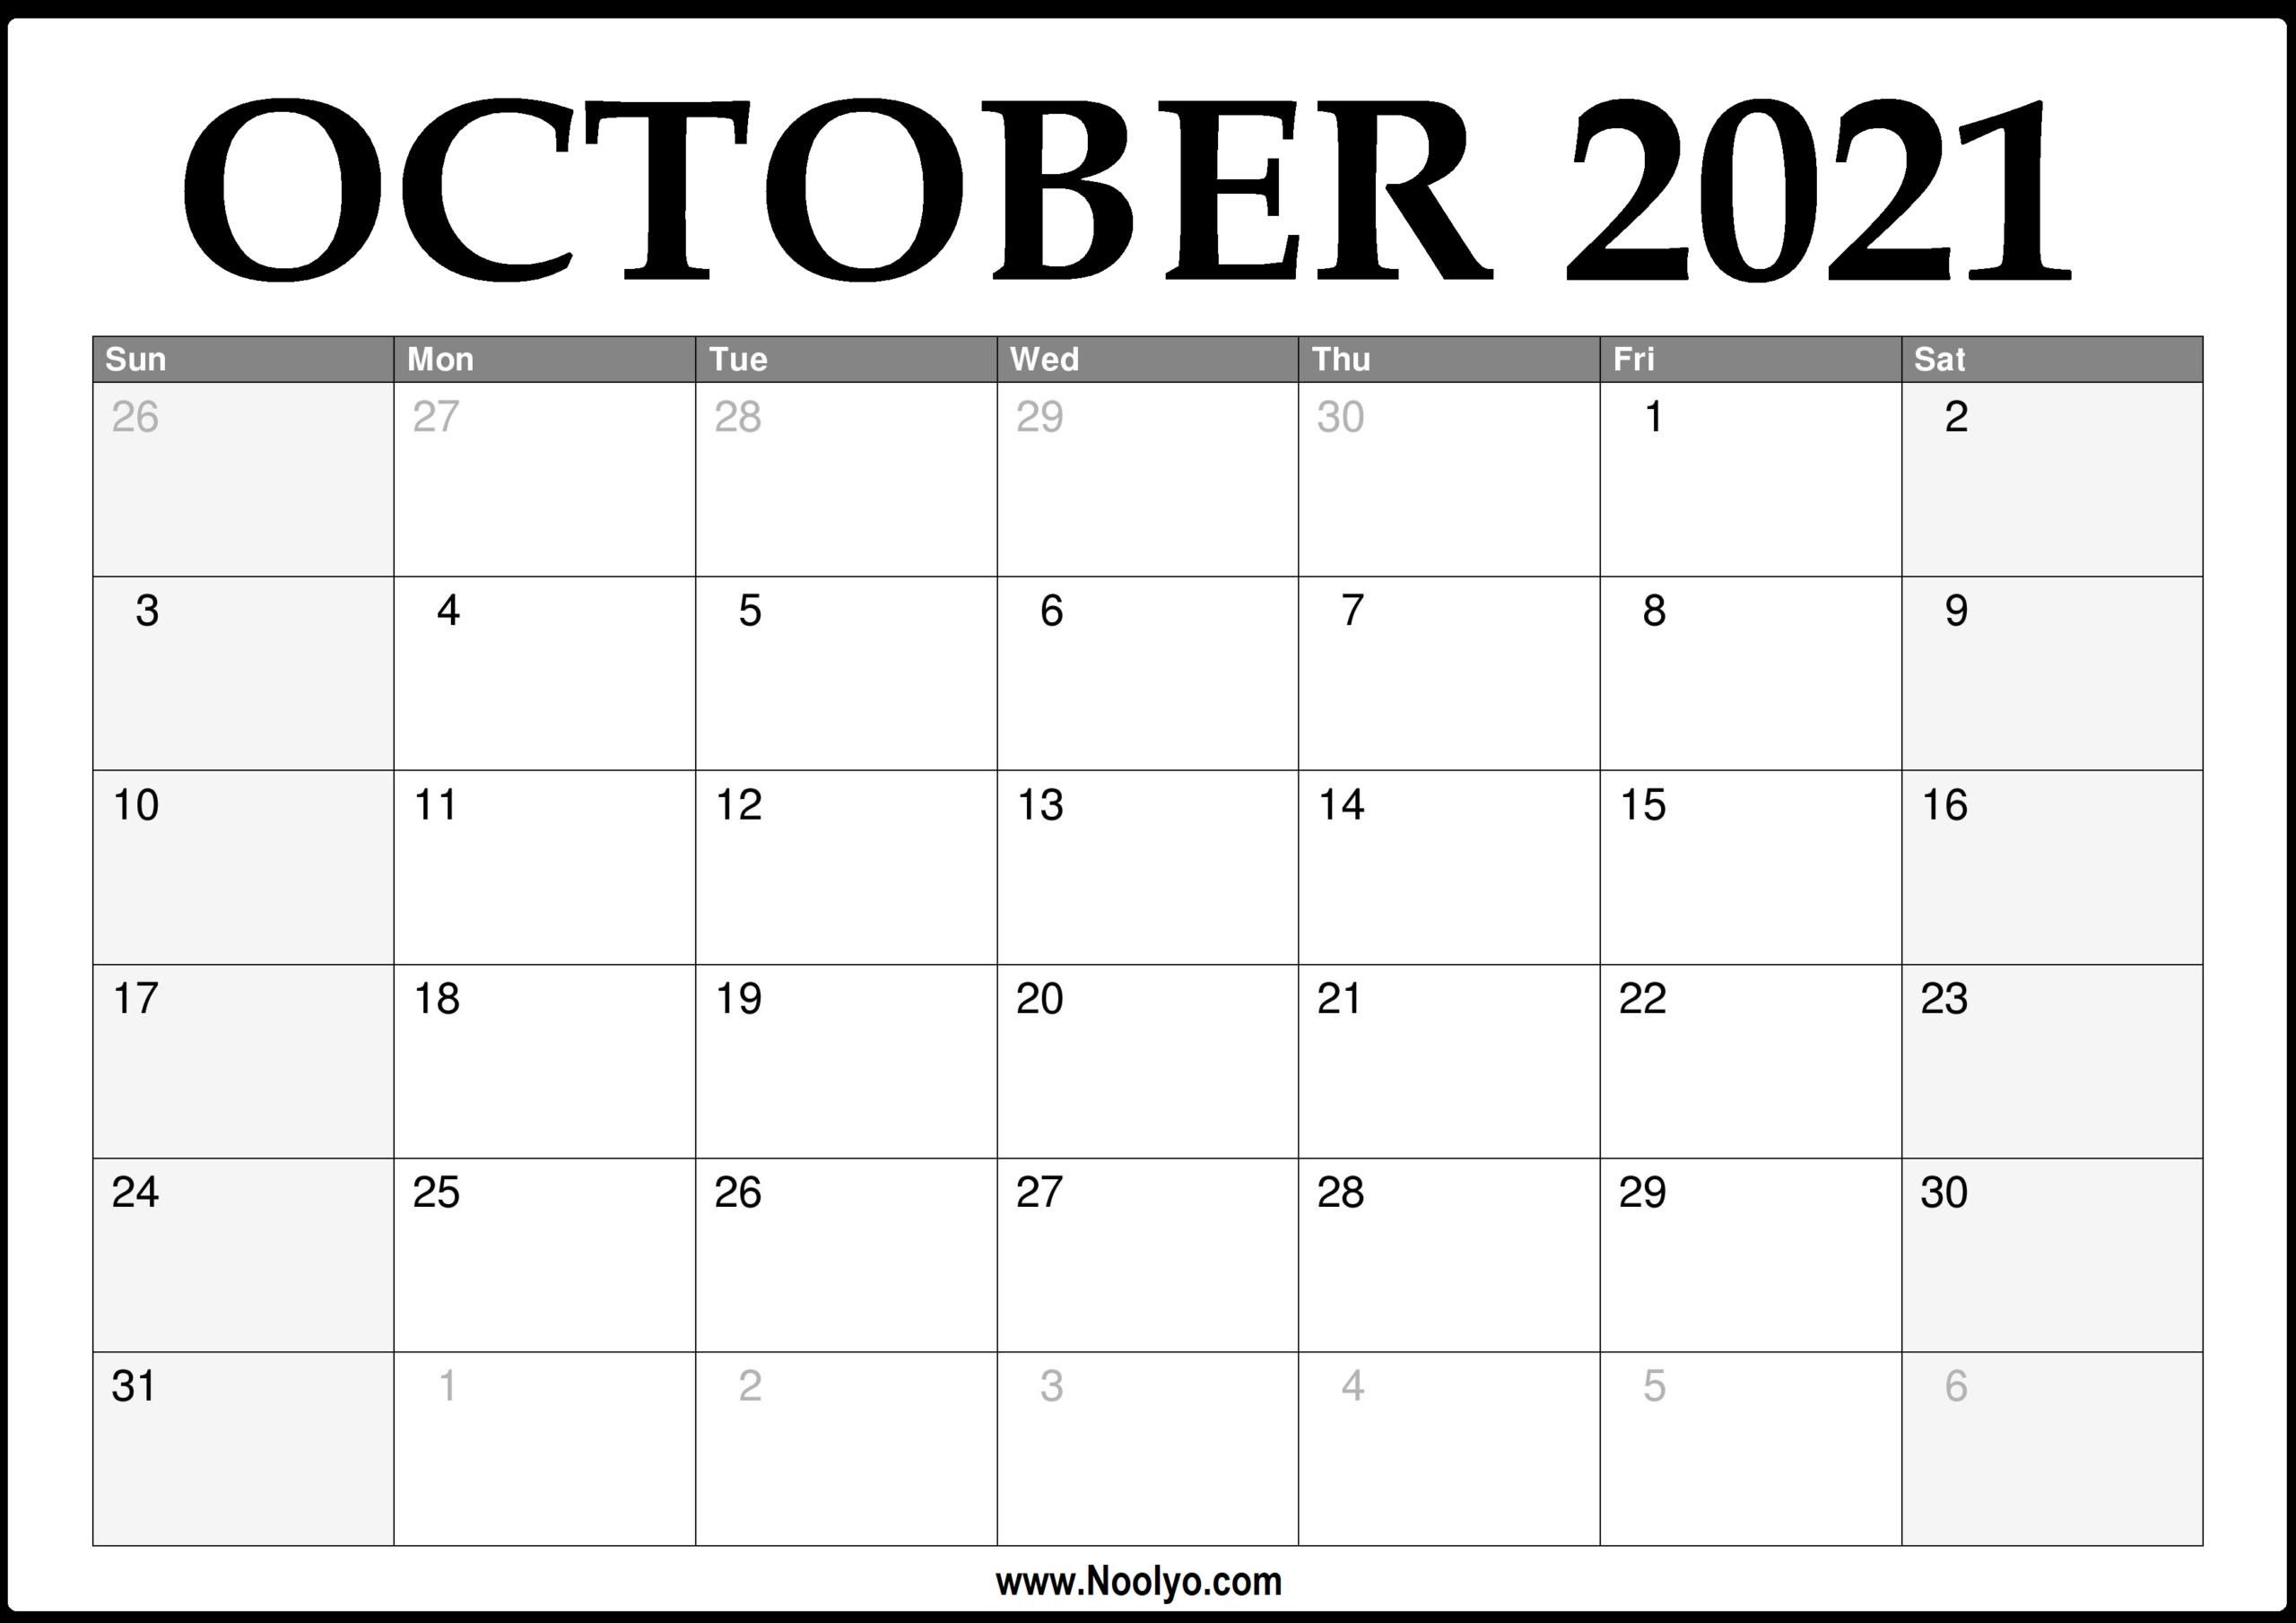 October 2021 Thru December 2021 Calendar | Calendar